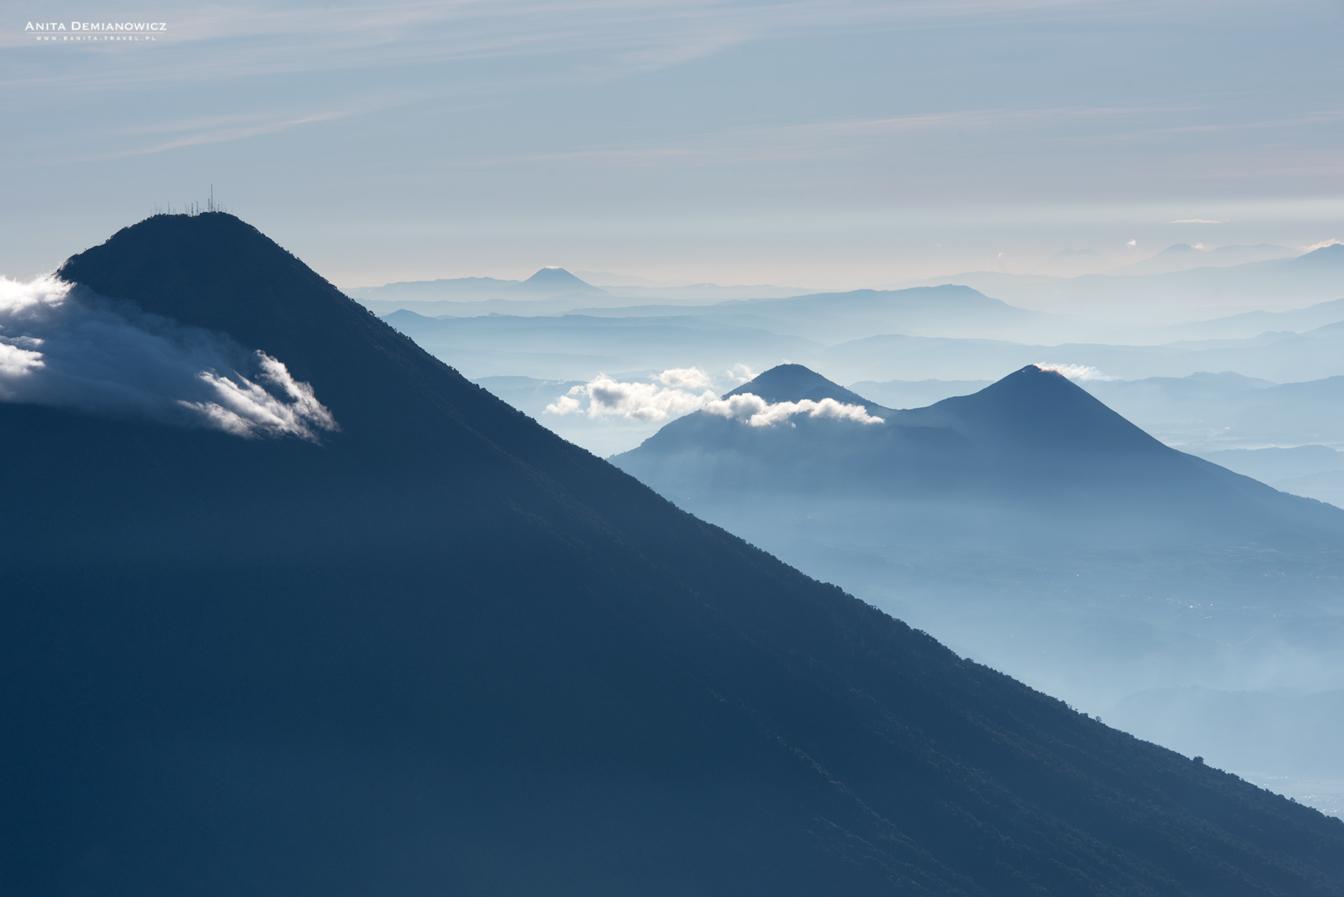 Widok zeszczytu wulkanu Acatenango